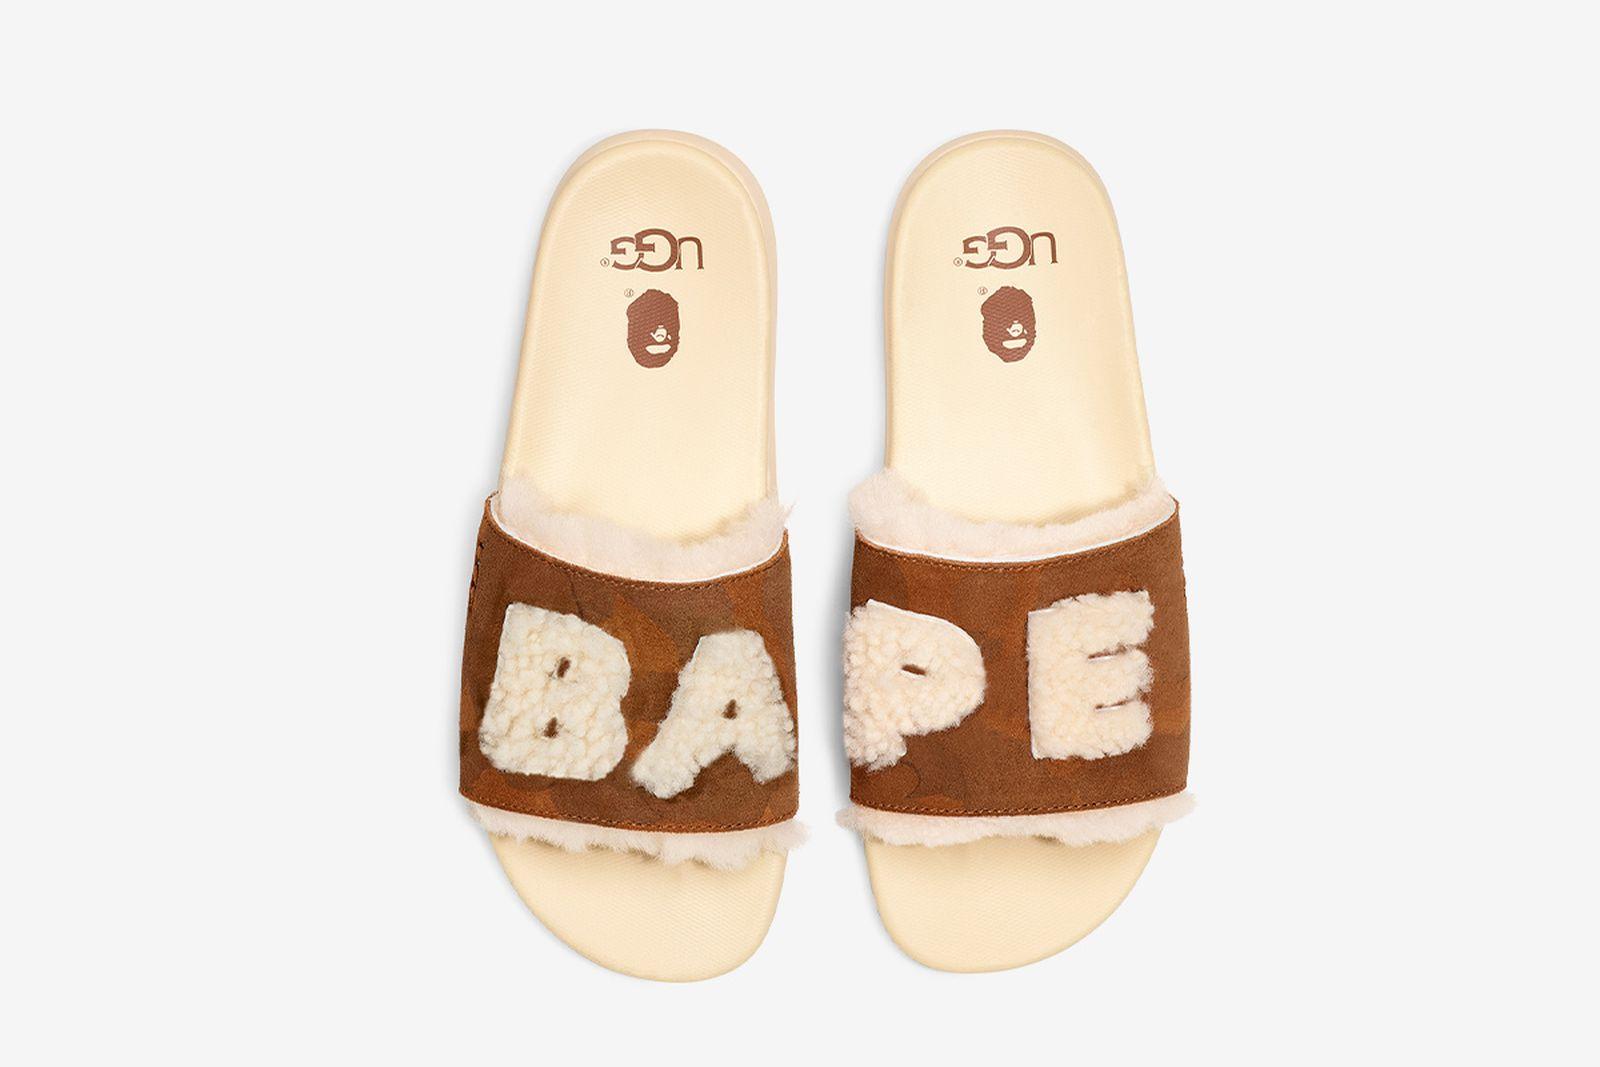 bape ugg sneaker release date price